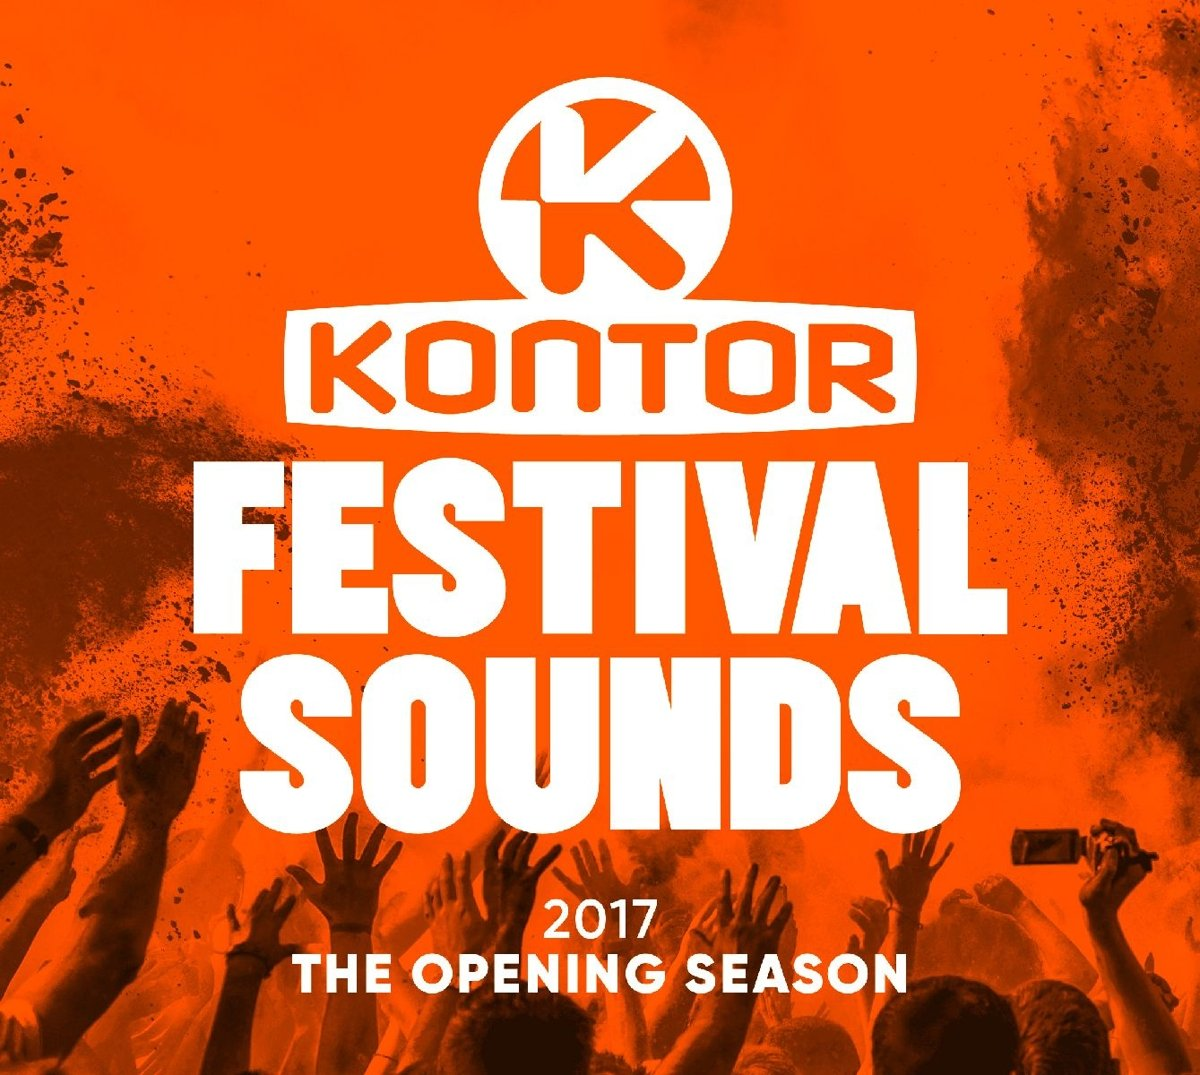 VA - Kontor Festival Sounds 2017 ..<br>Kontor Festival Sounds 2017 The Opening Season (2017) [FLAC] Download